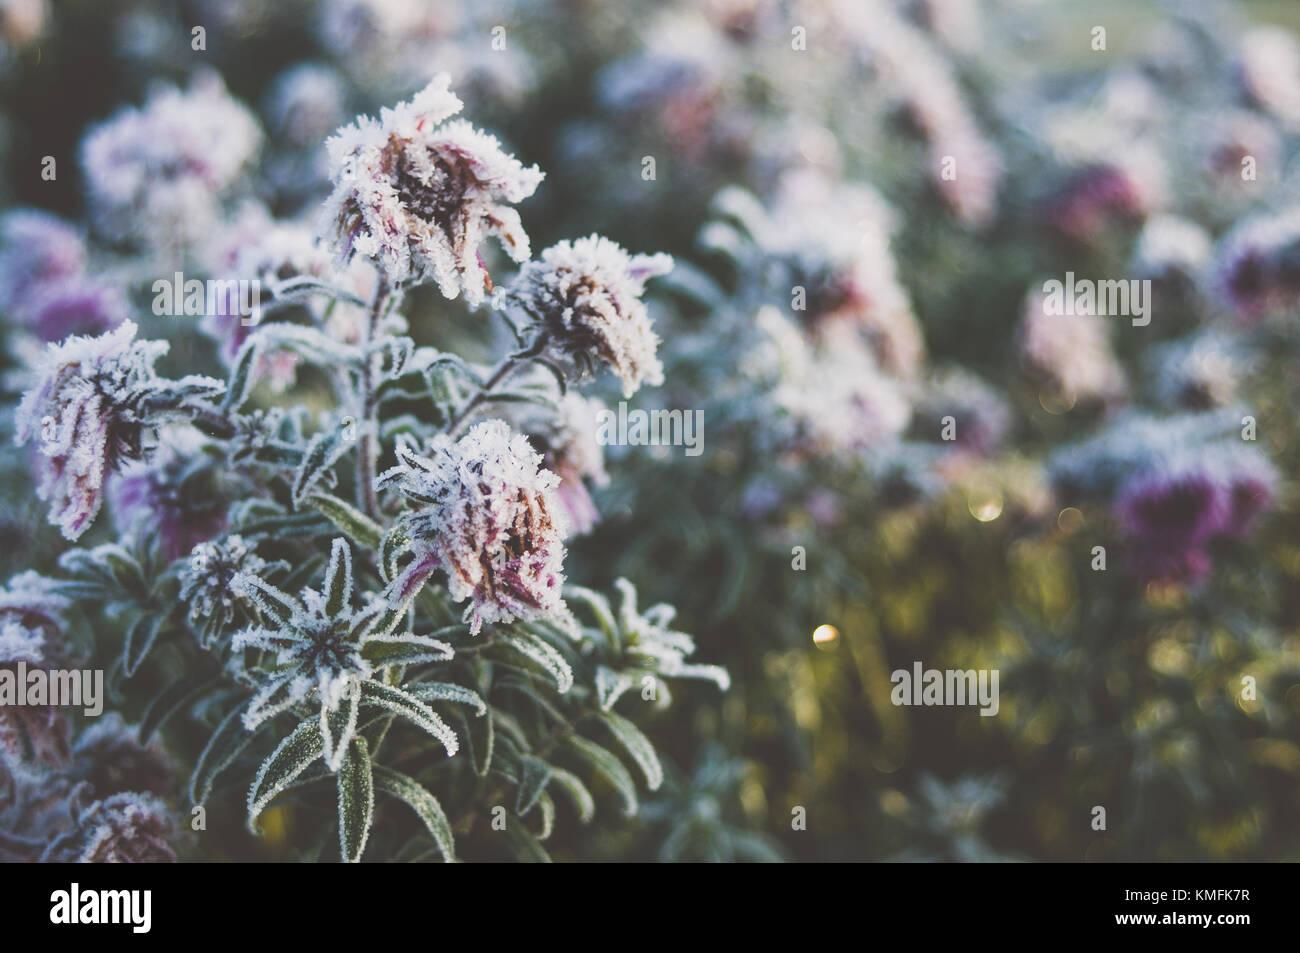 Flores congeladas. Romántica por la mañana. Imagen De Stock